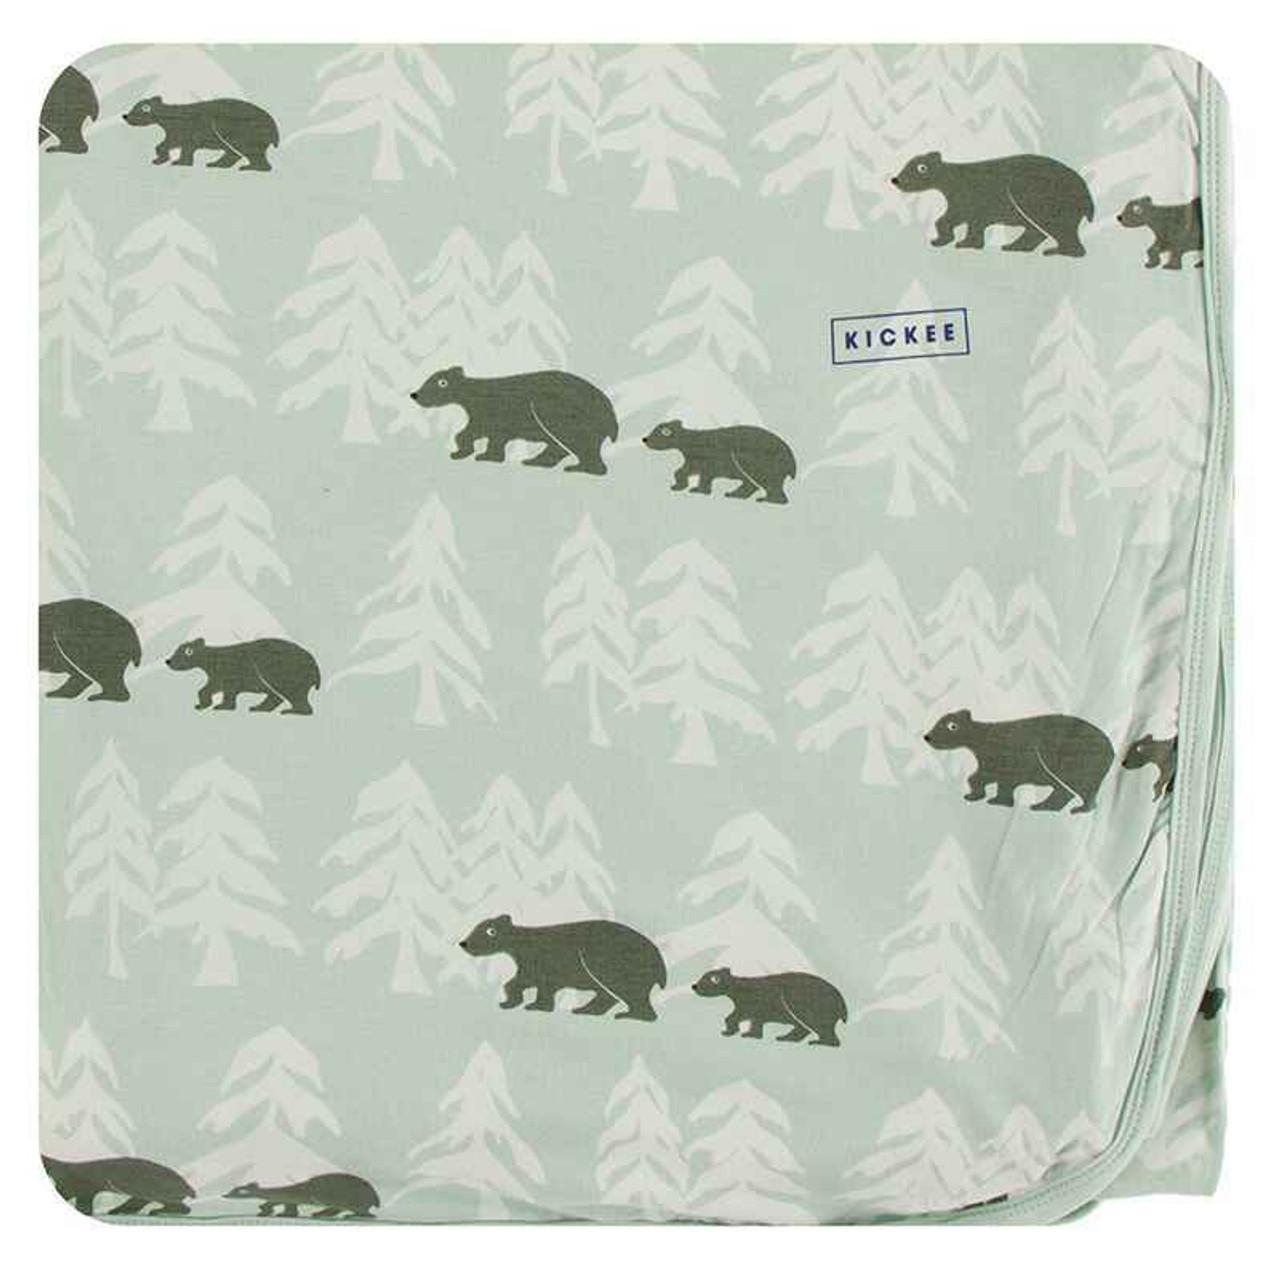 Print Stroller Blanket Aloe Endangered Animals - One Size